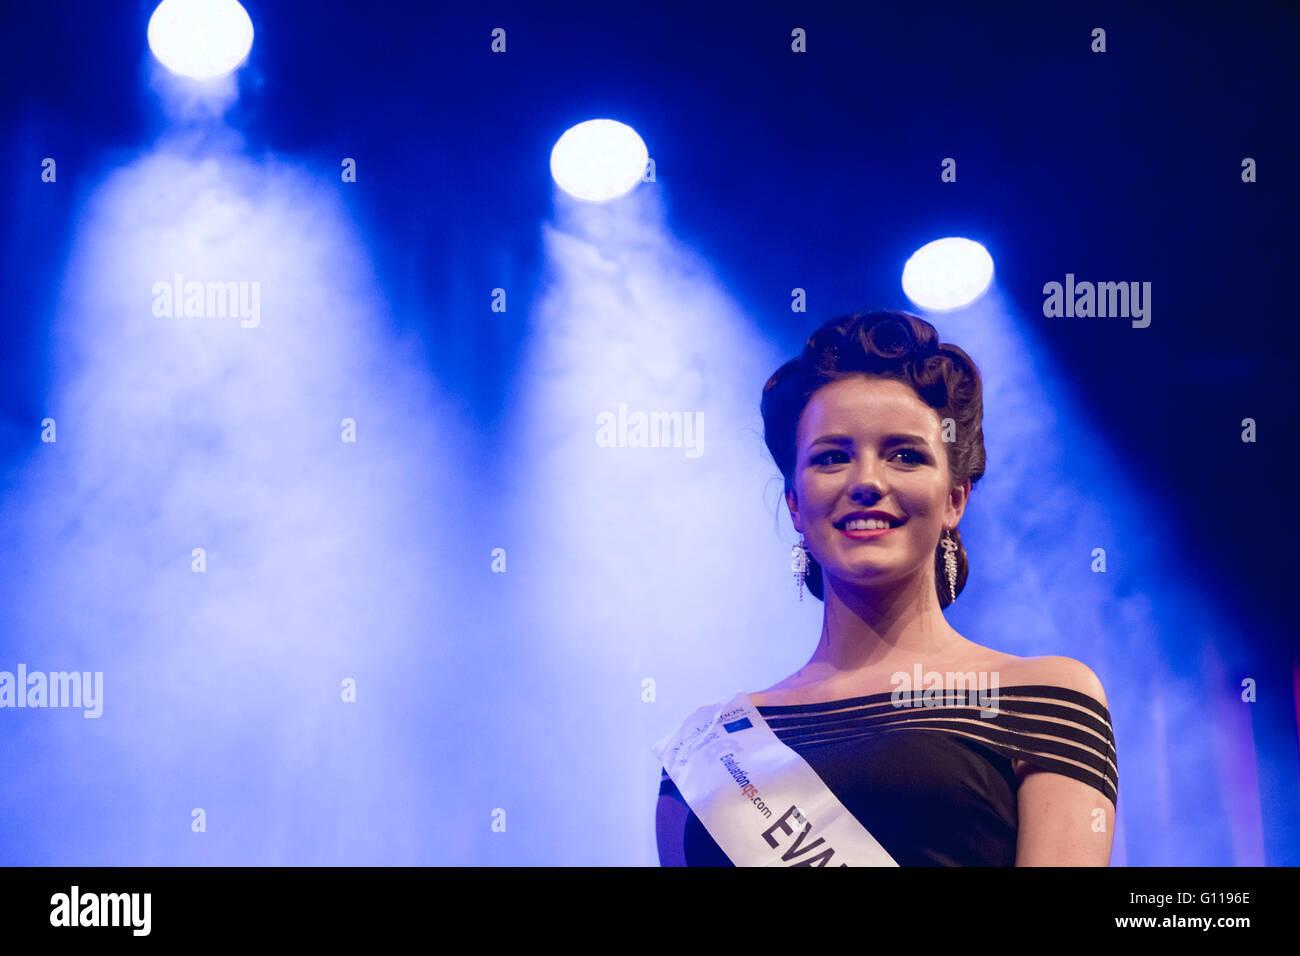 London, UK. 6th May, 2016. Miss London 2016 Finale Credit:  Guy Corbishley/Alamy Live News - Stock Image